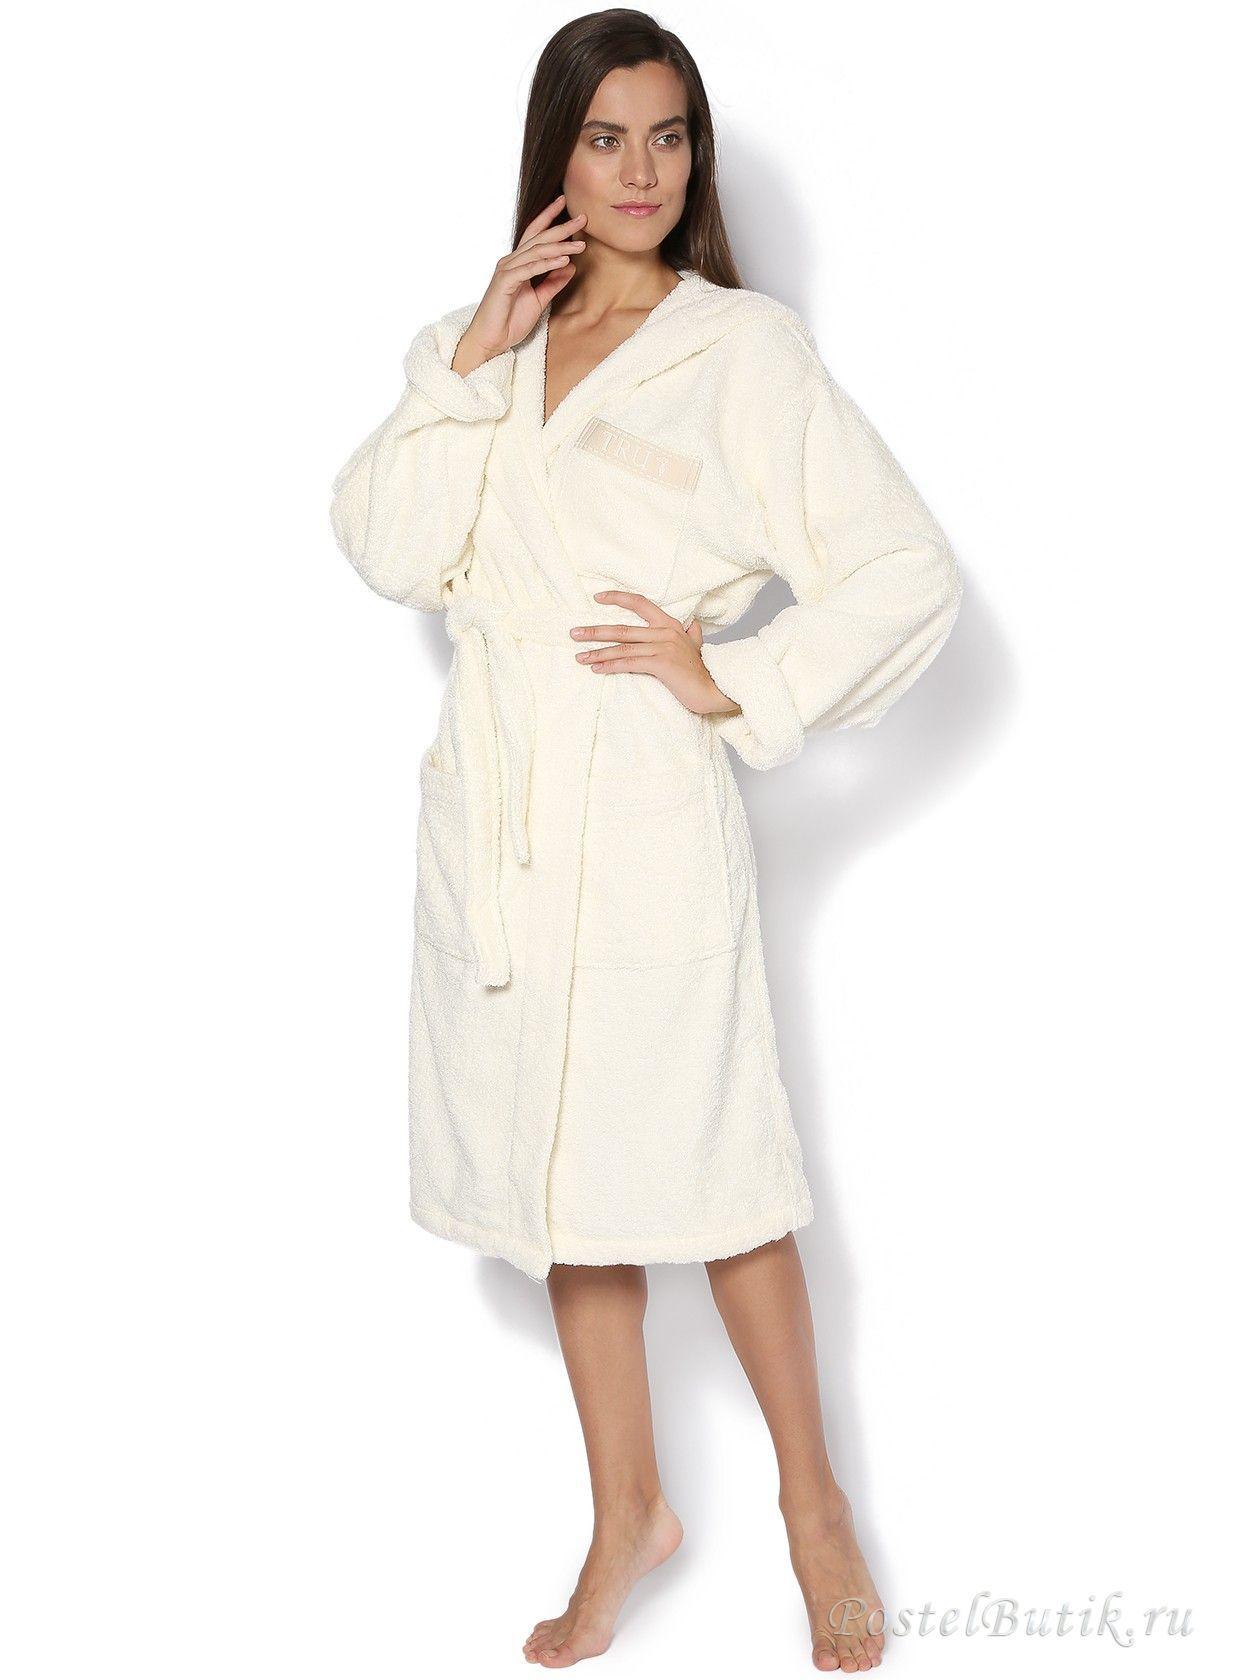 Халаты Элитный махровый халат Golf ваниль от Trussardi elitniy-halat-golf-vanil-ot-trussardi-italiya.jpg